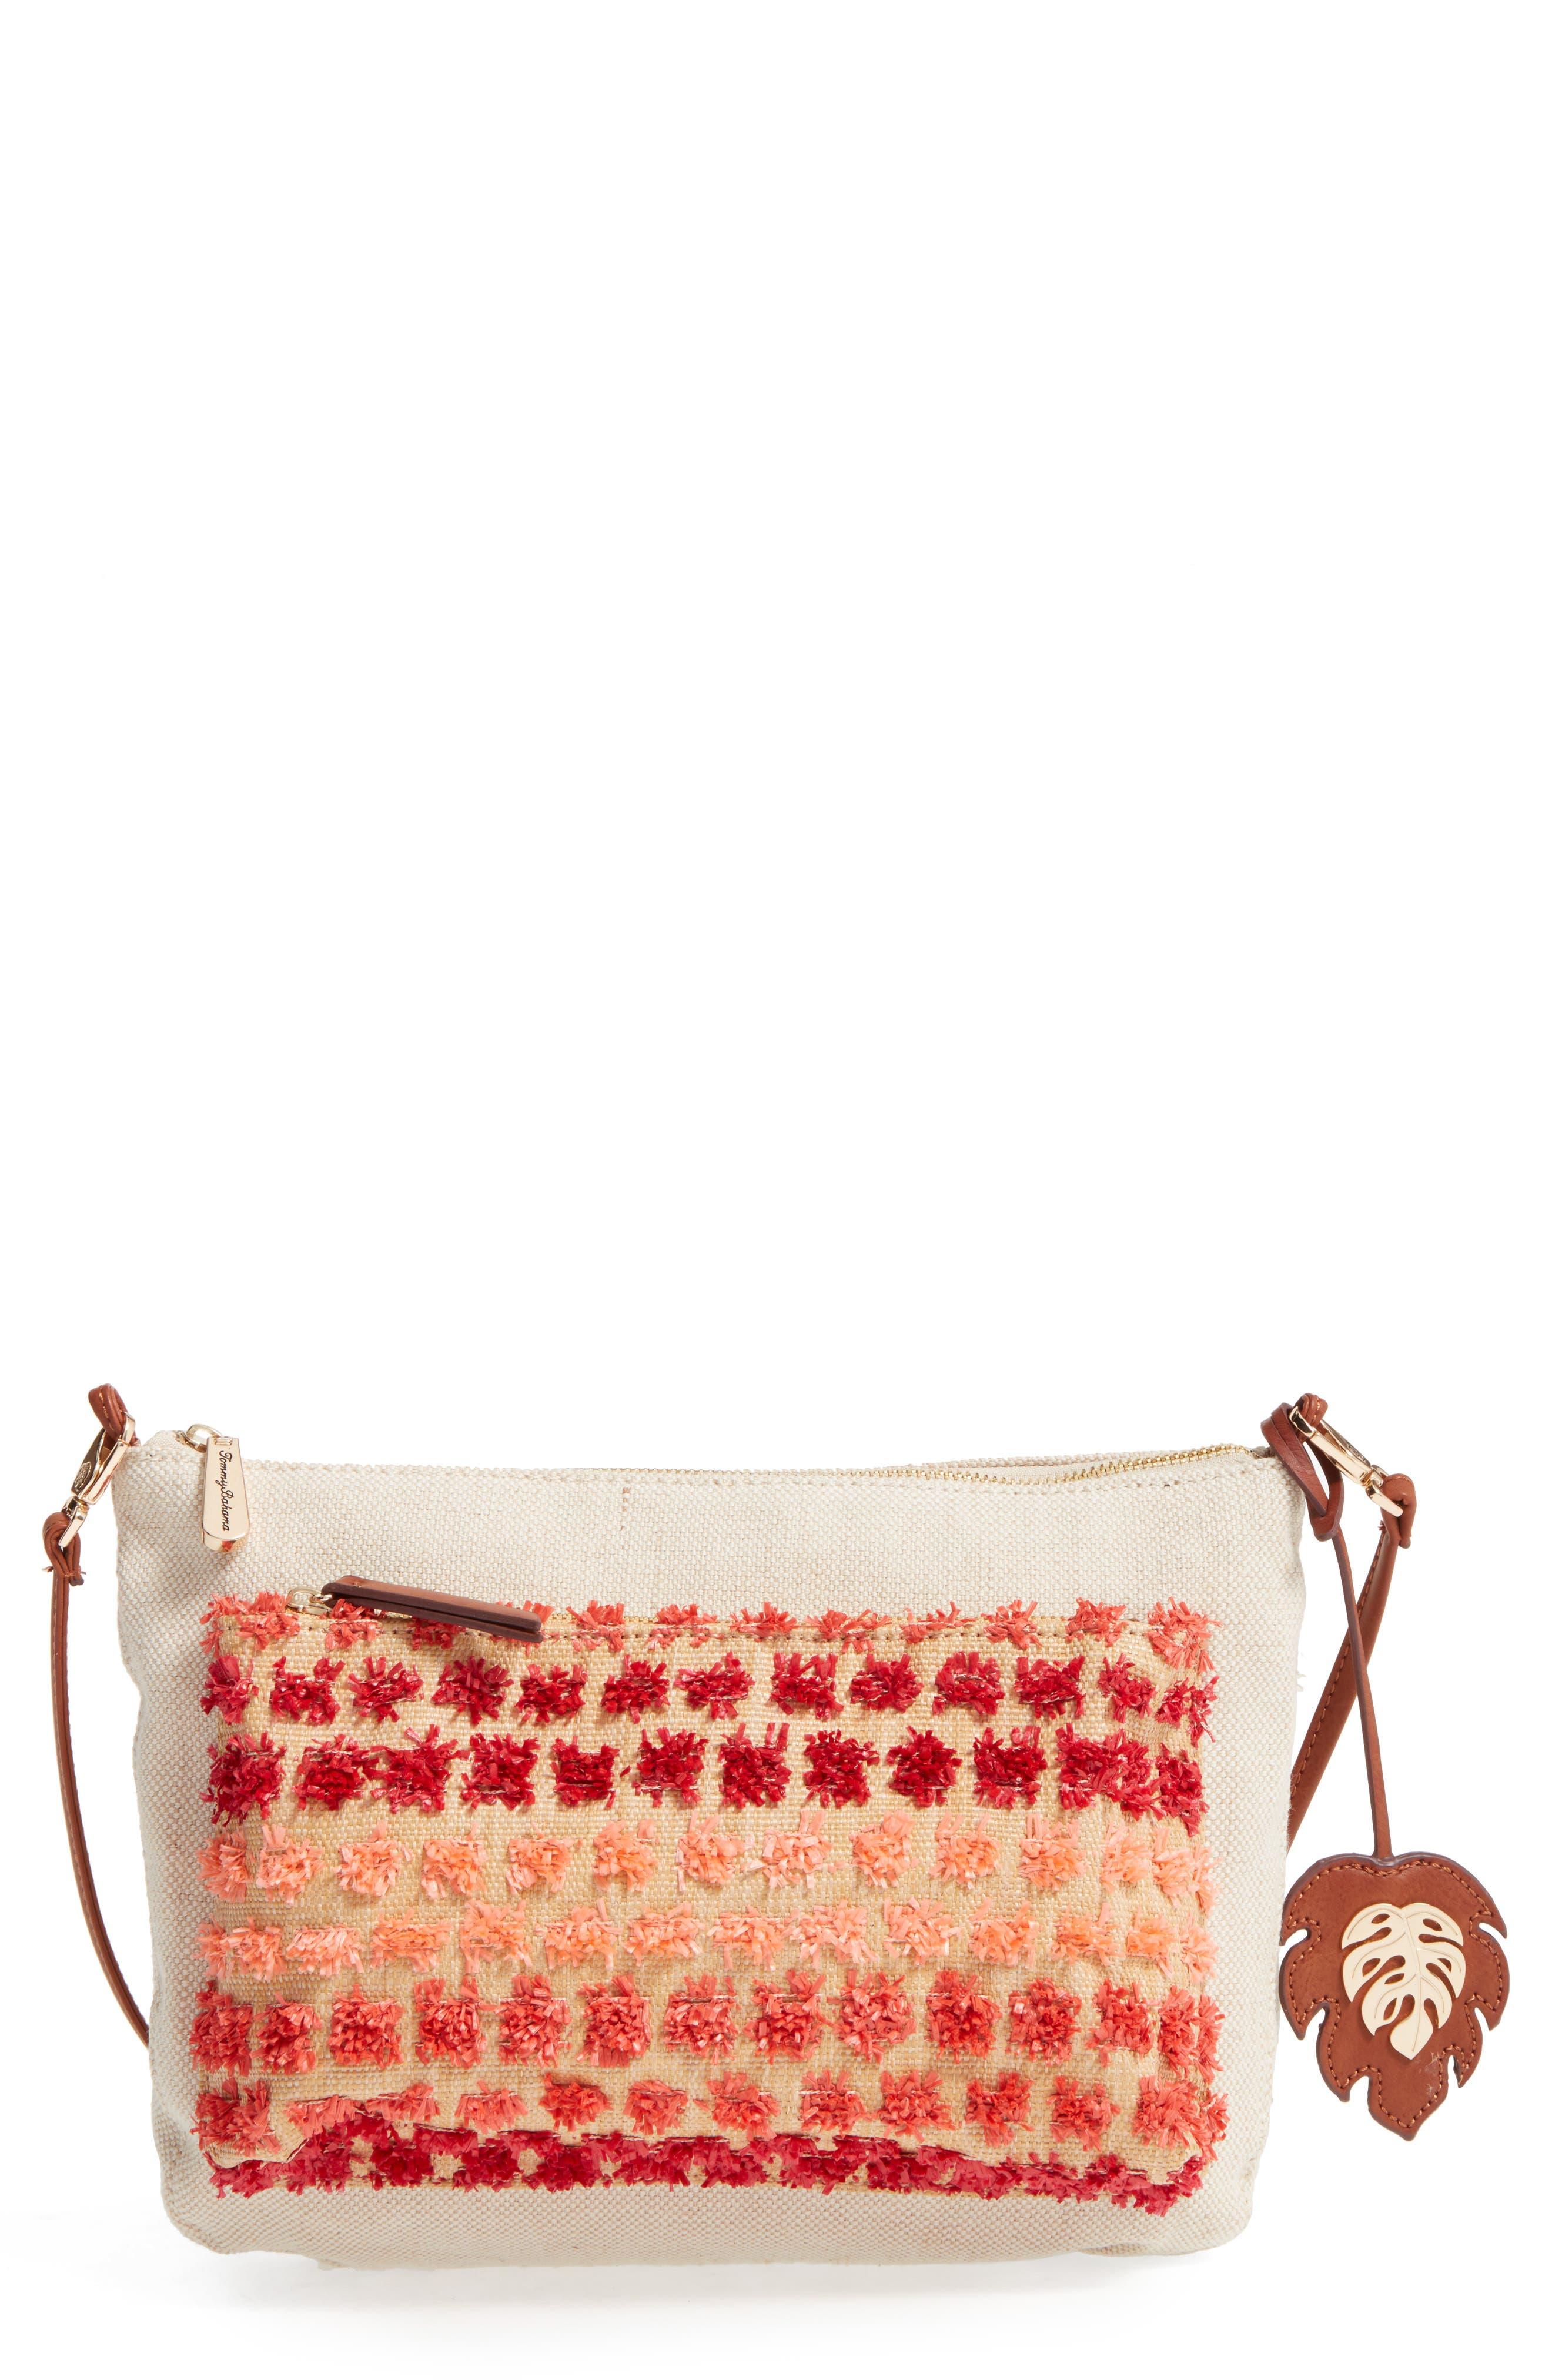 Koki Beach Crossbody Bag,                         Main,                         color, 250